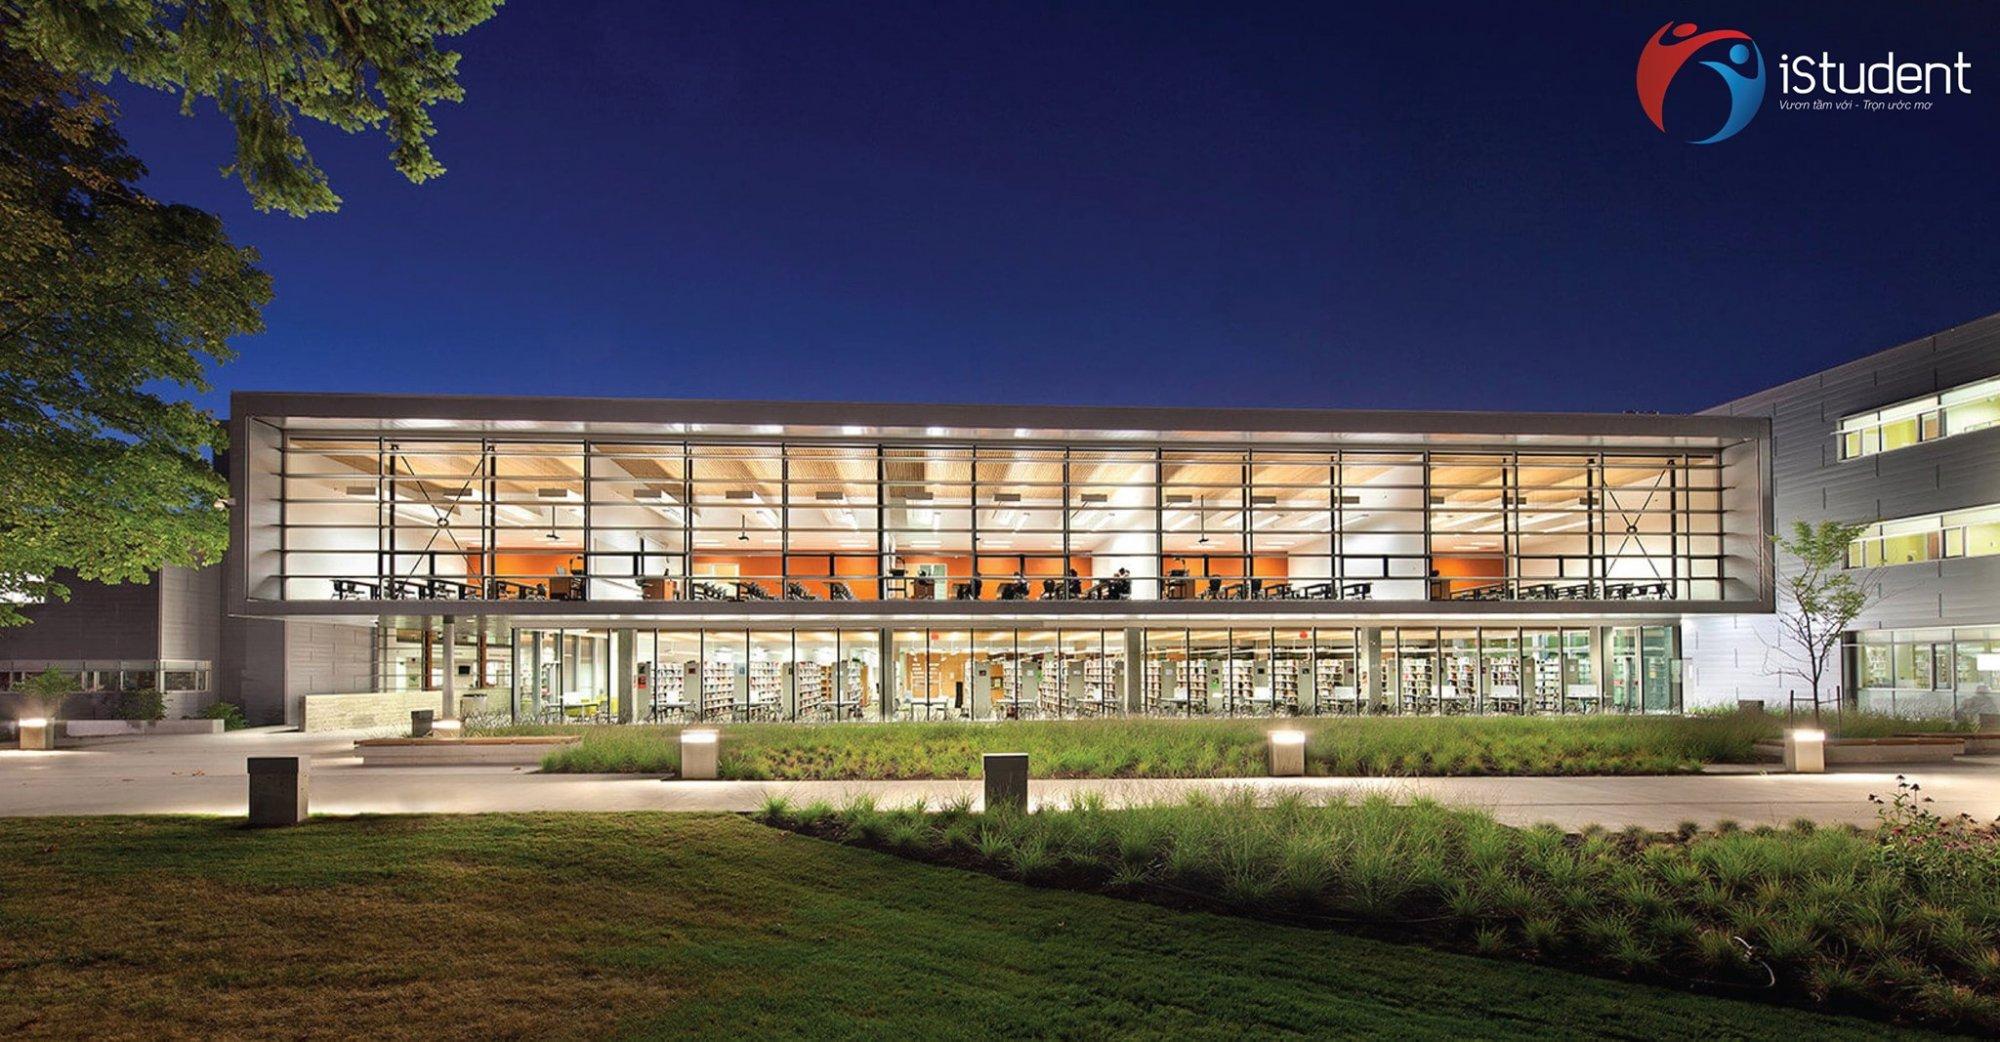 University of theFraser Valley - Du học Canada